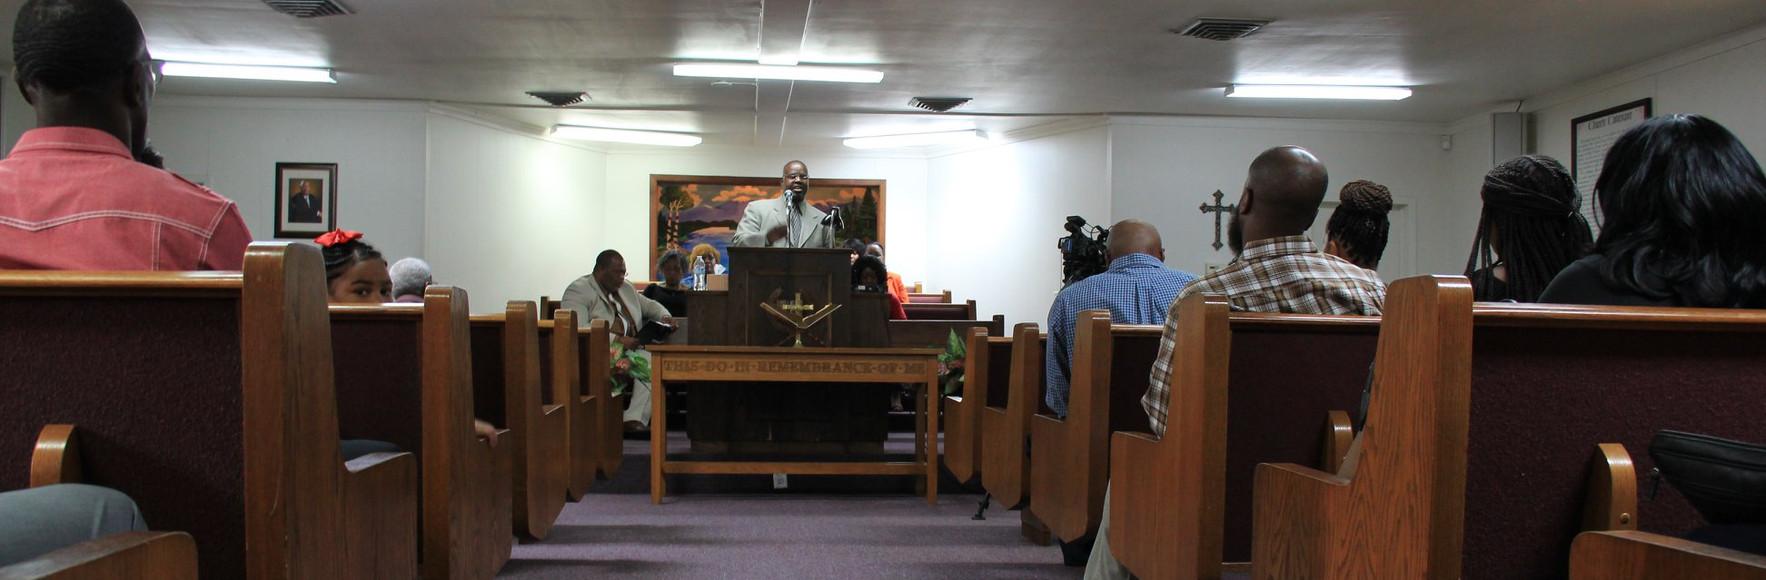 Church Service 4.jpg